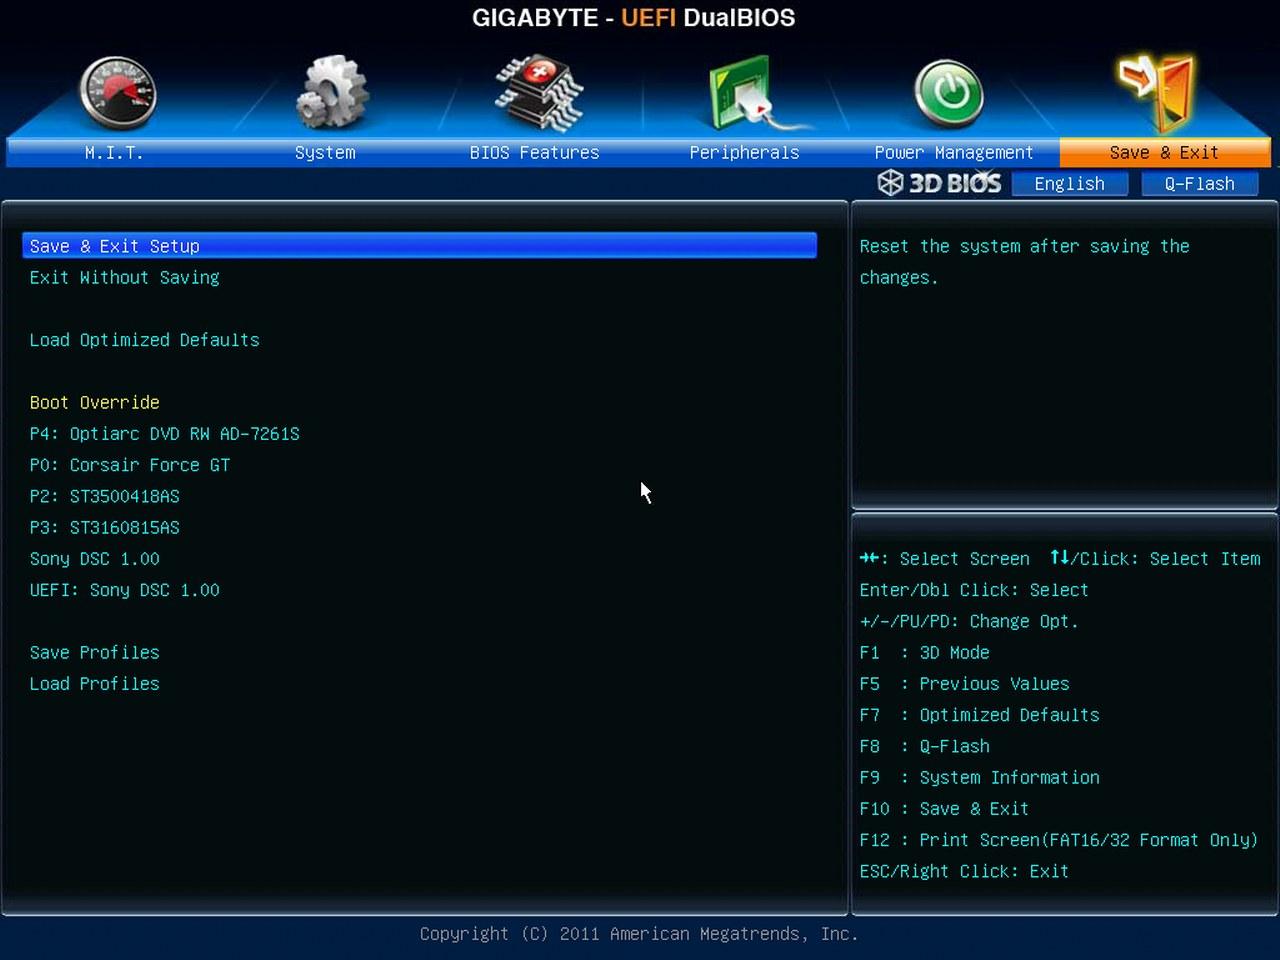 Gigabyte Z77X-UD5H-WB WIFI, BIOS UEFI,